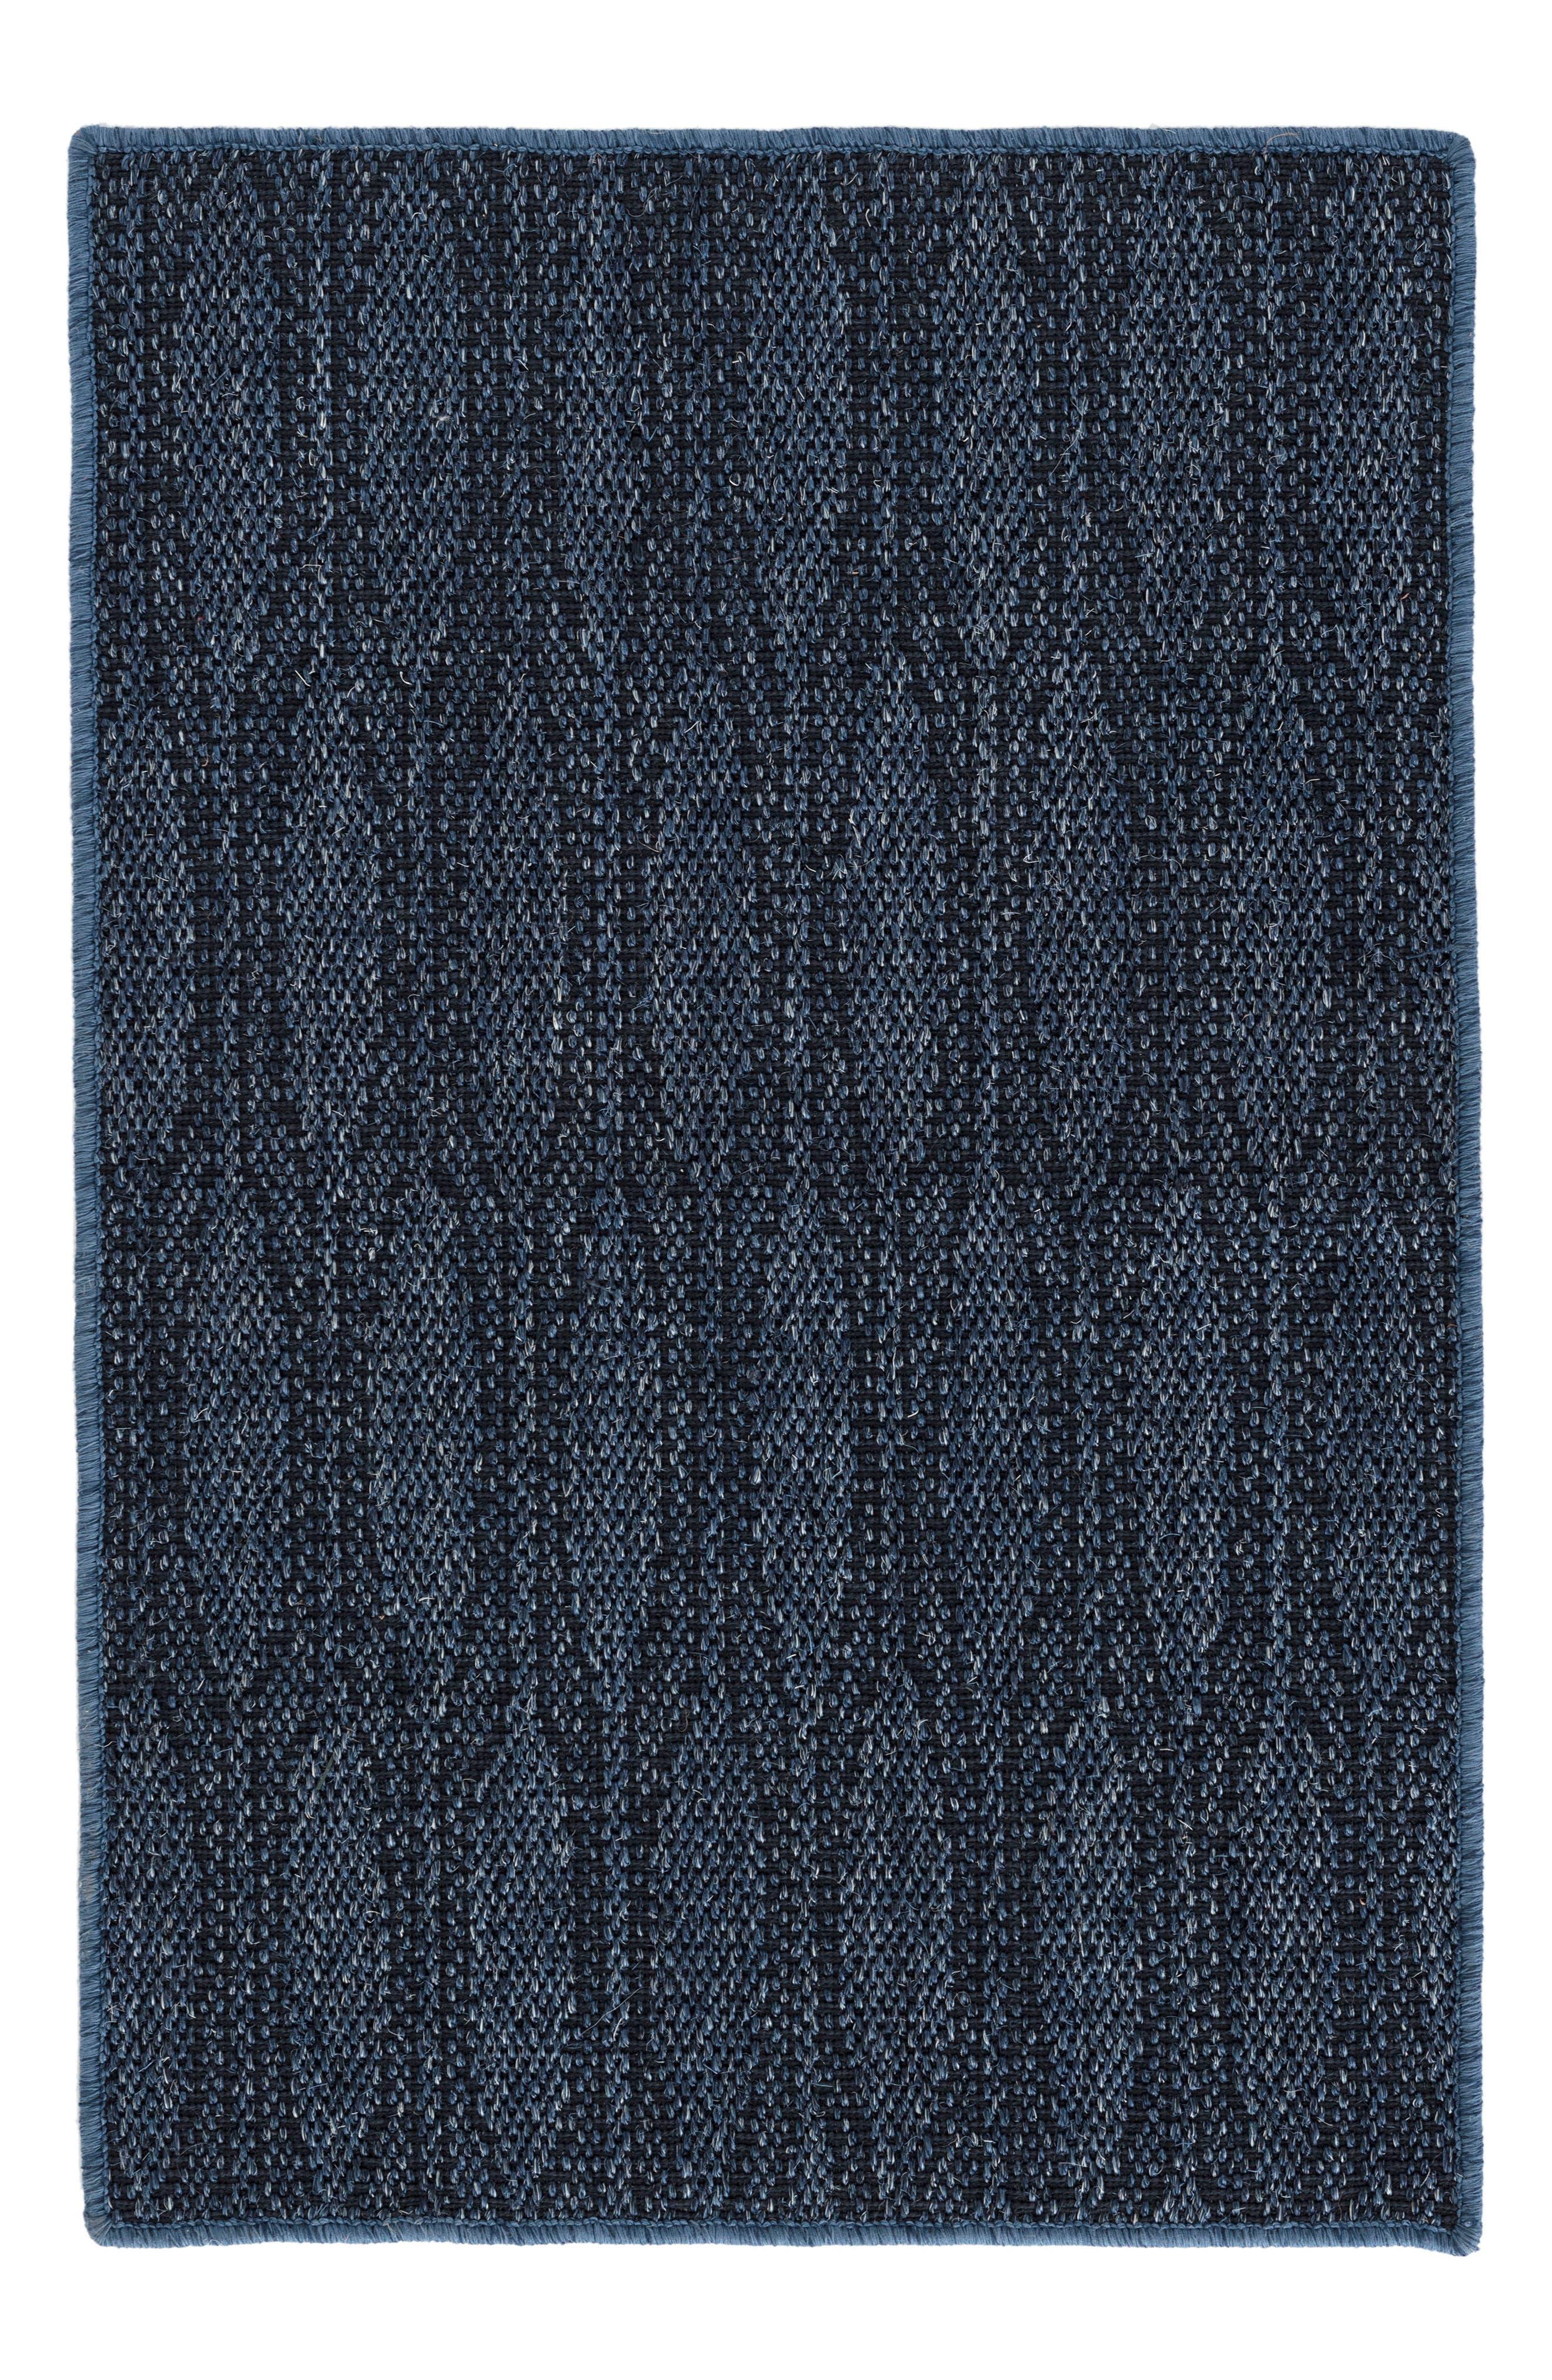 Elliptic Indigo Woven Rug,                         Main,                         color, Blue